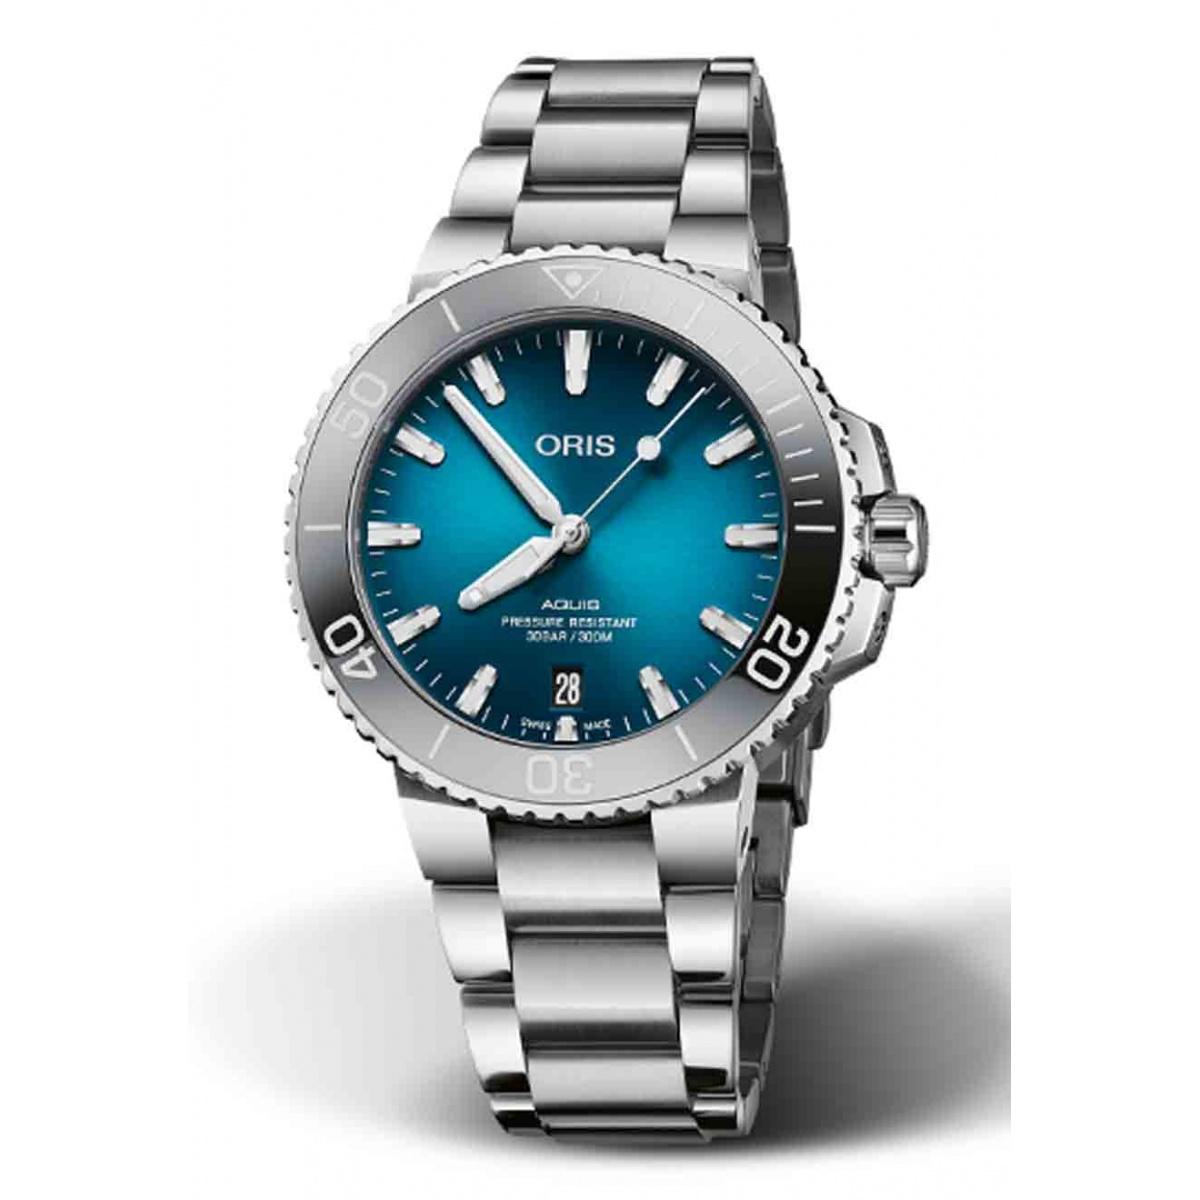 ORIS AQUIS DATE 300 M ∅39,5 mm, Esfera azul, brazalete acero